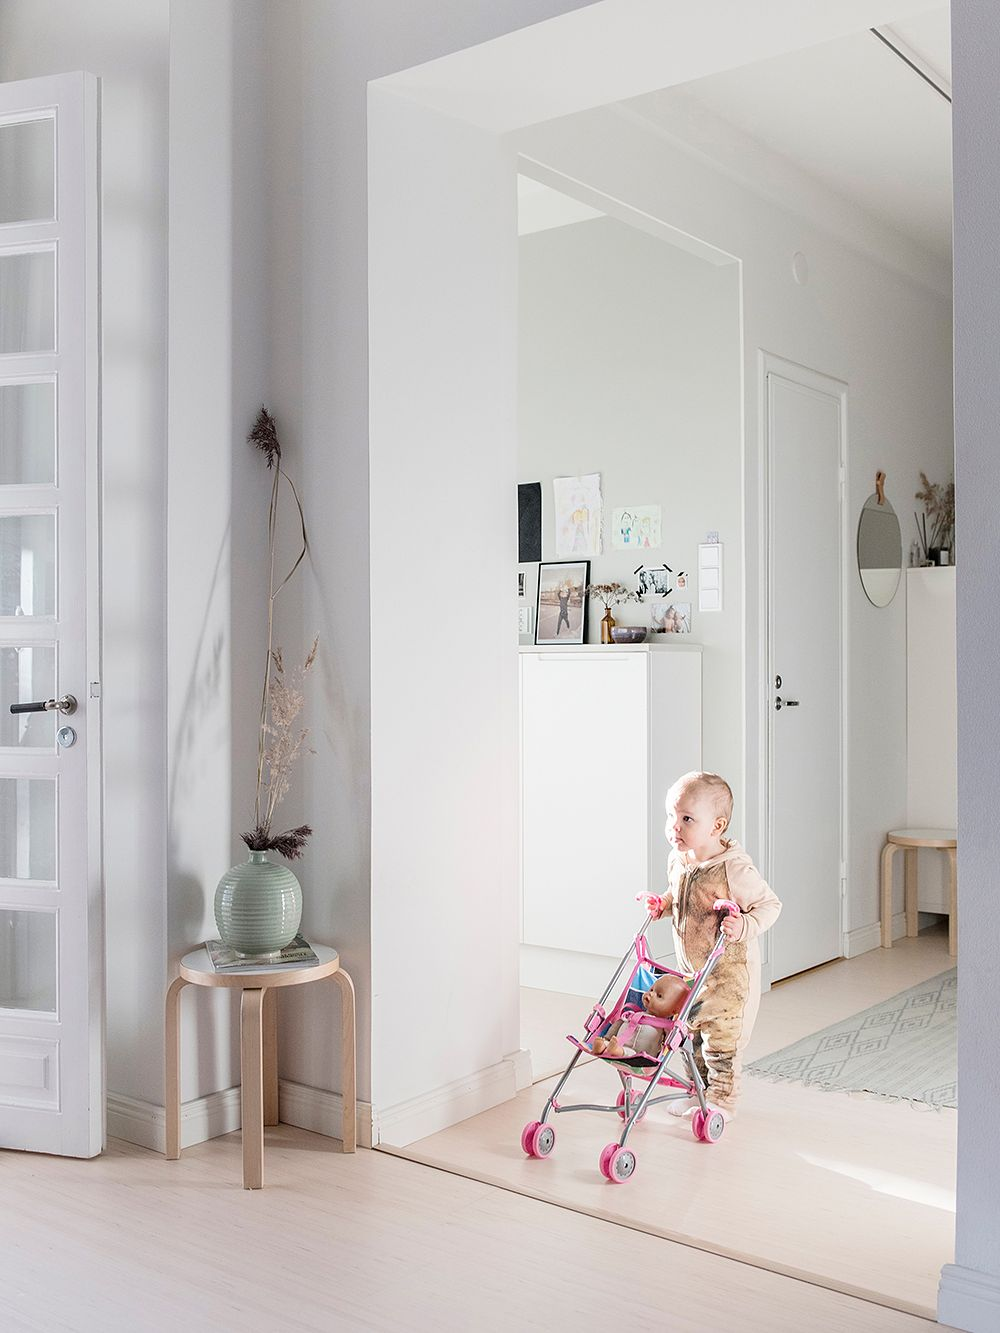 Aalto E60 stool